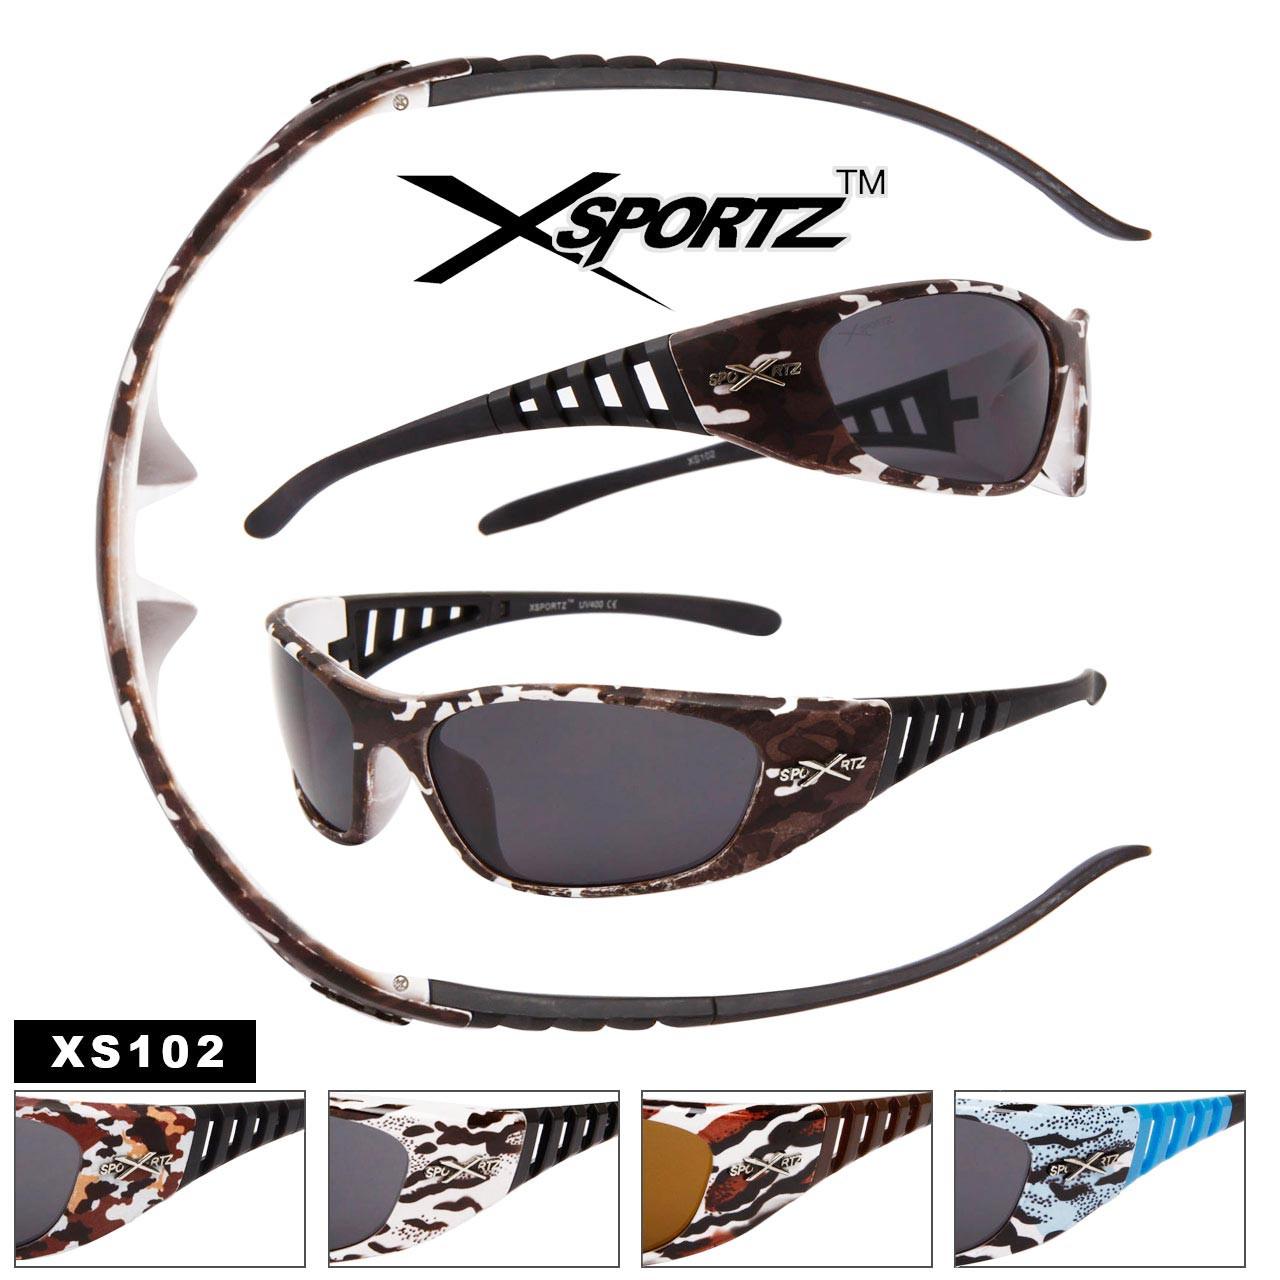 Xsportz™ Sunglasses Wholesale XS102